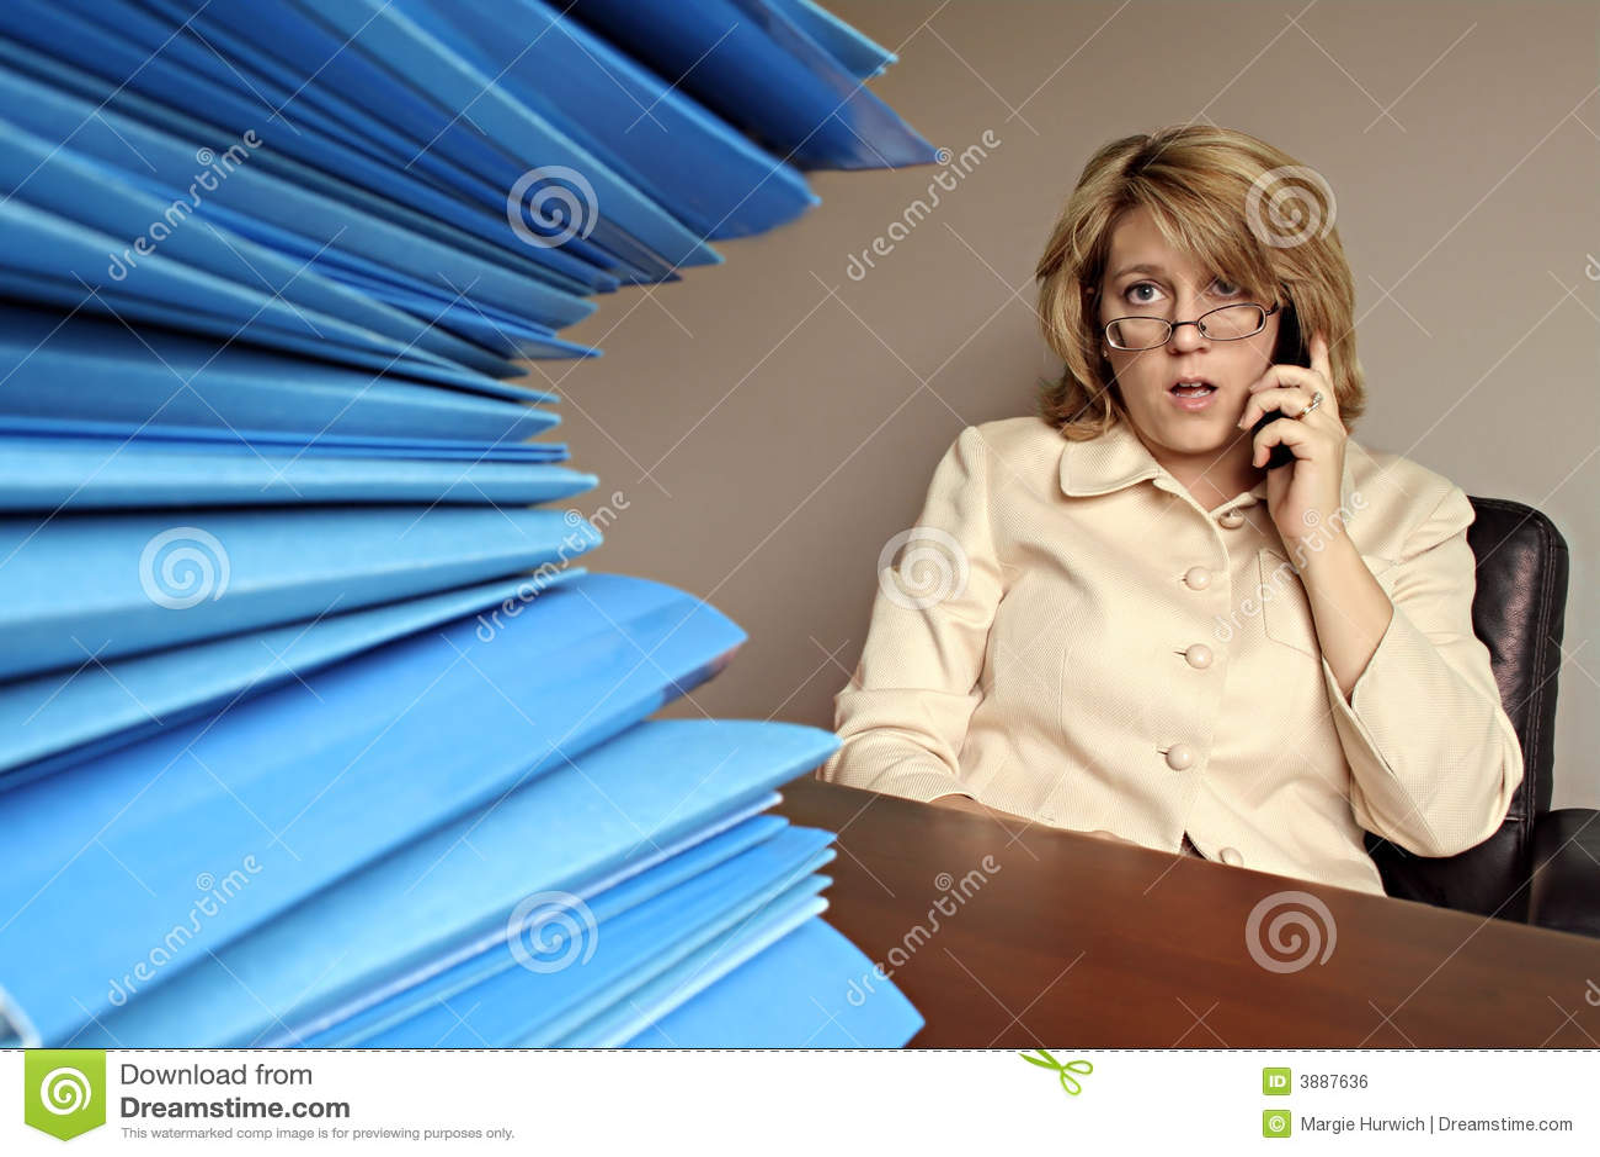 Frau am Telefon mit Datei-Faltblättern